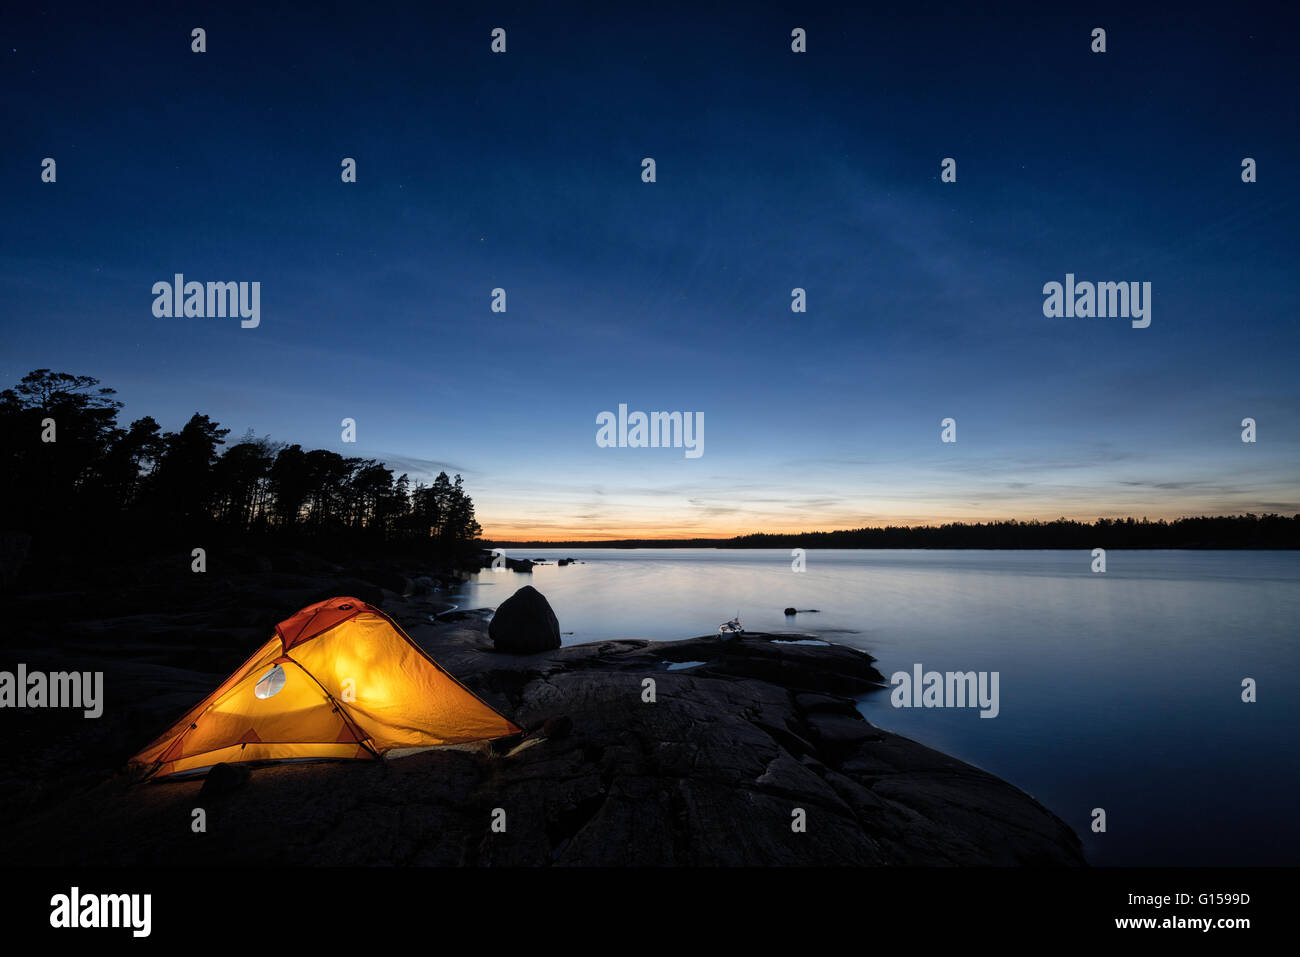 Le camping sur l'île Tallholmen, Loviisa, Finlande, Europe, UNION EUROPÉENNE Photo Stock